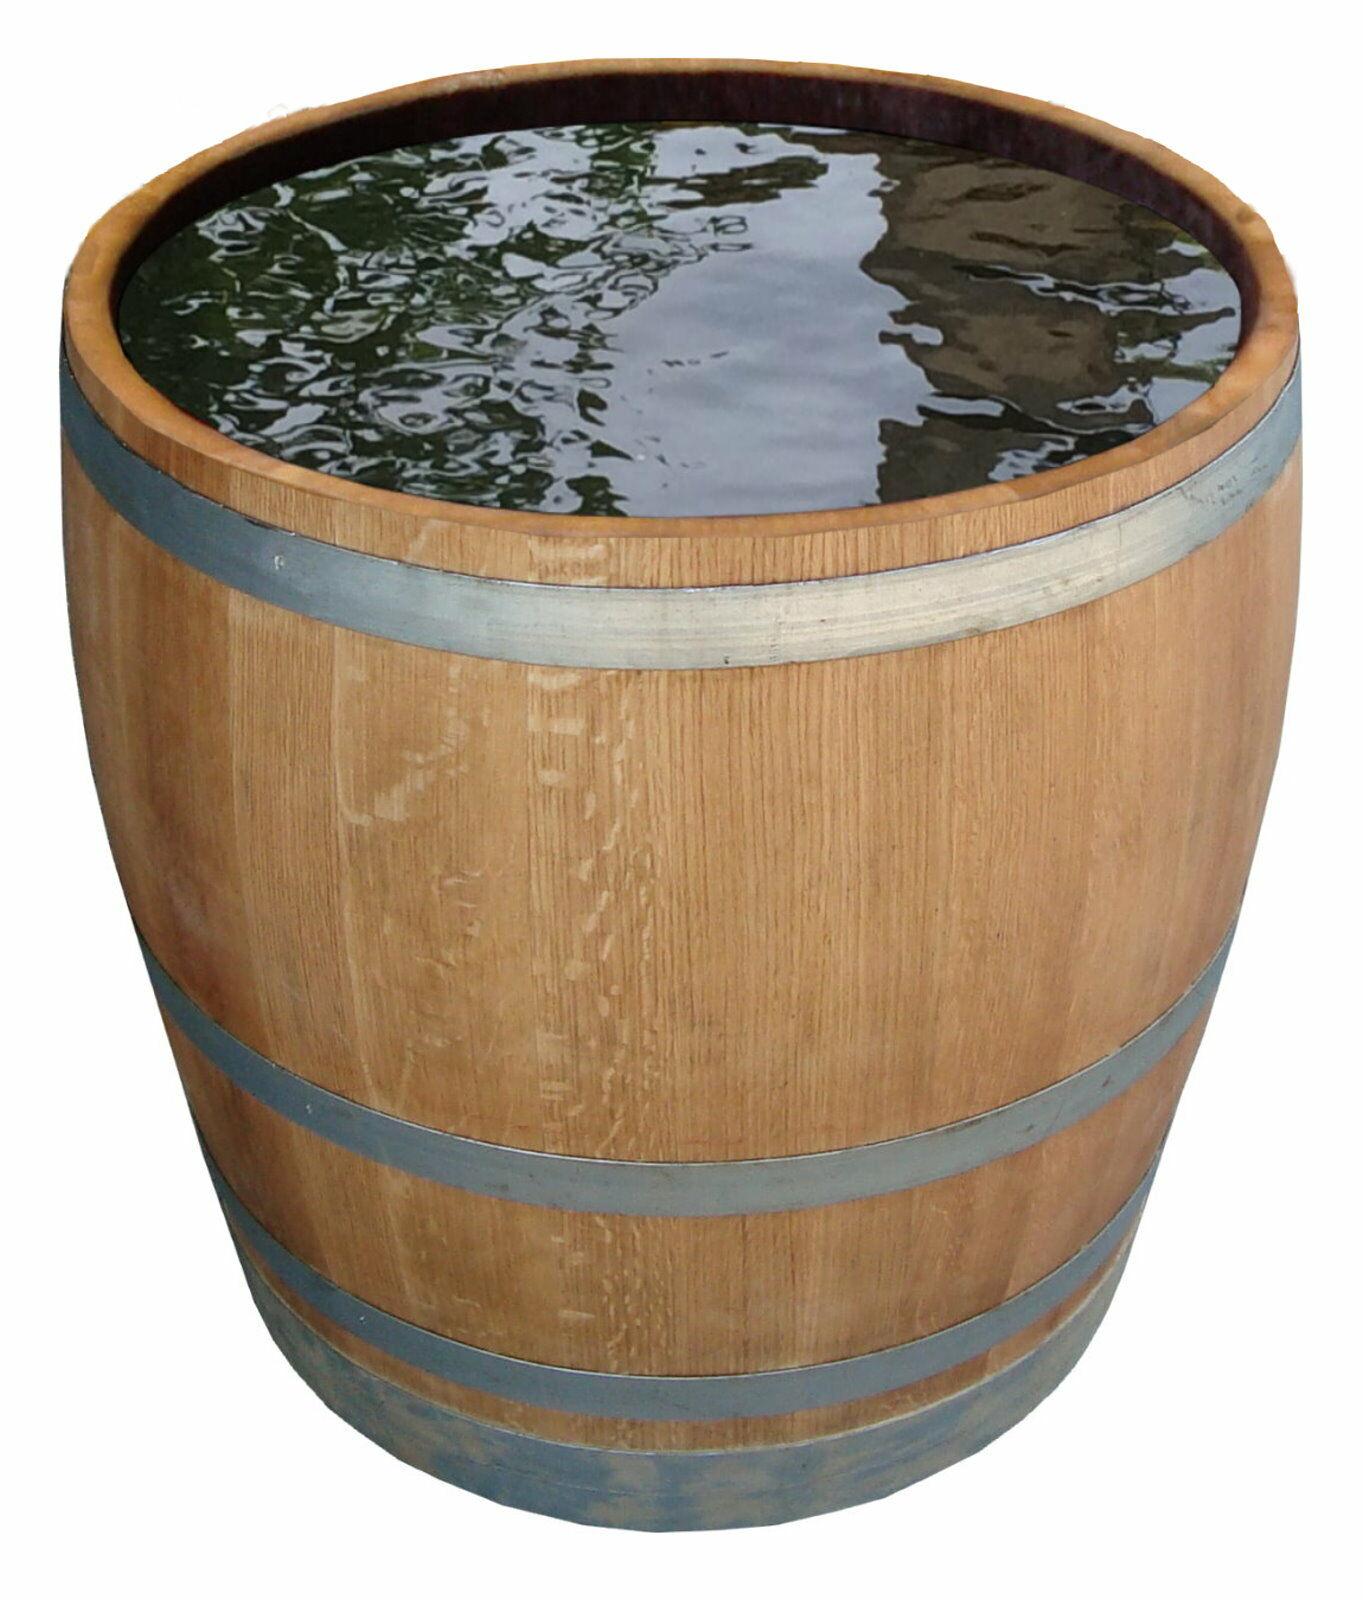 Holzfaß,Weinfaß,Regentonne,Faß,Eichenfaß, Miniteich,Pflanzkübel,Regenfaß,40-180L